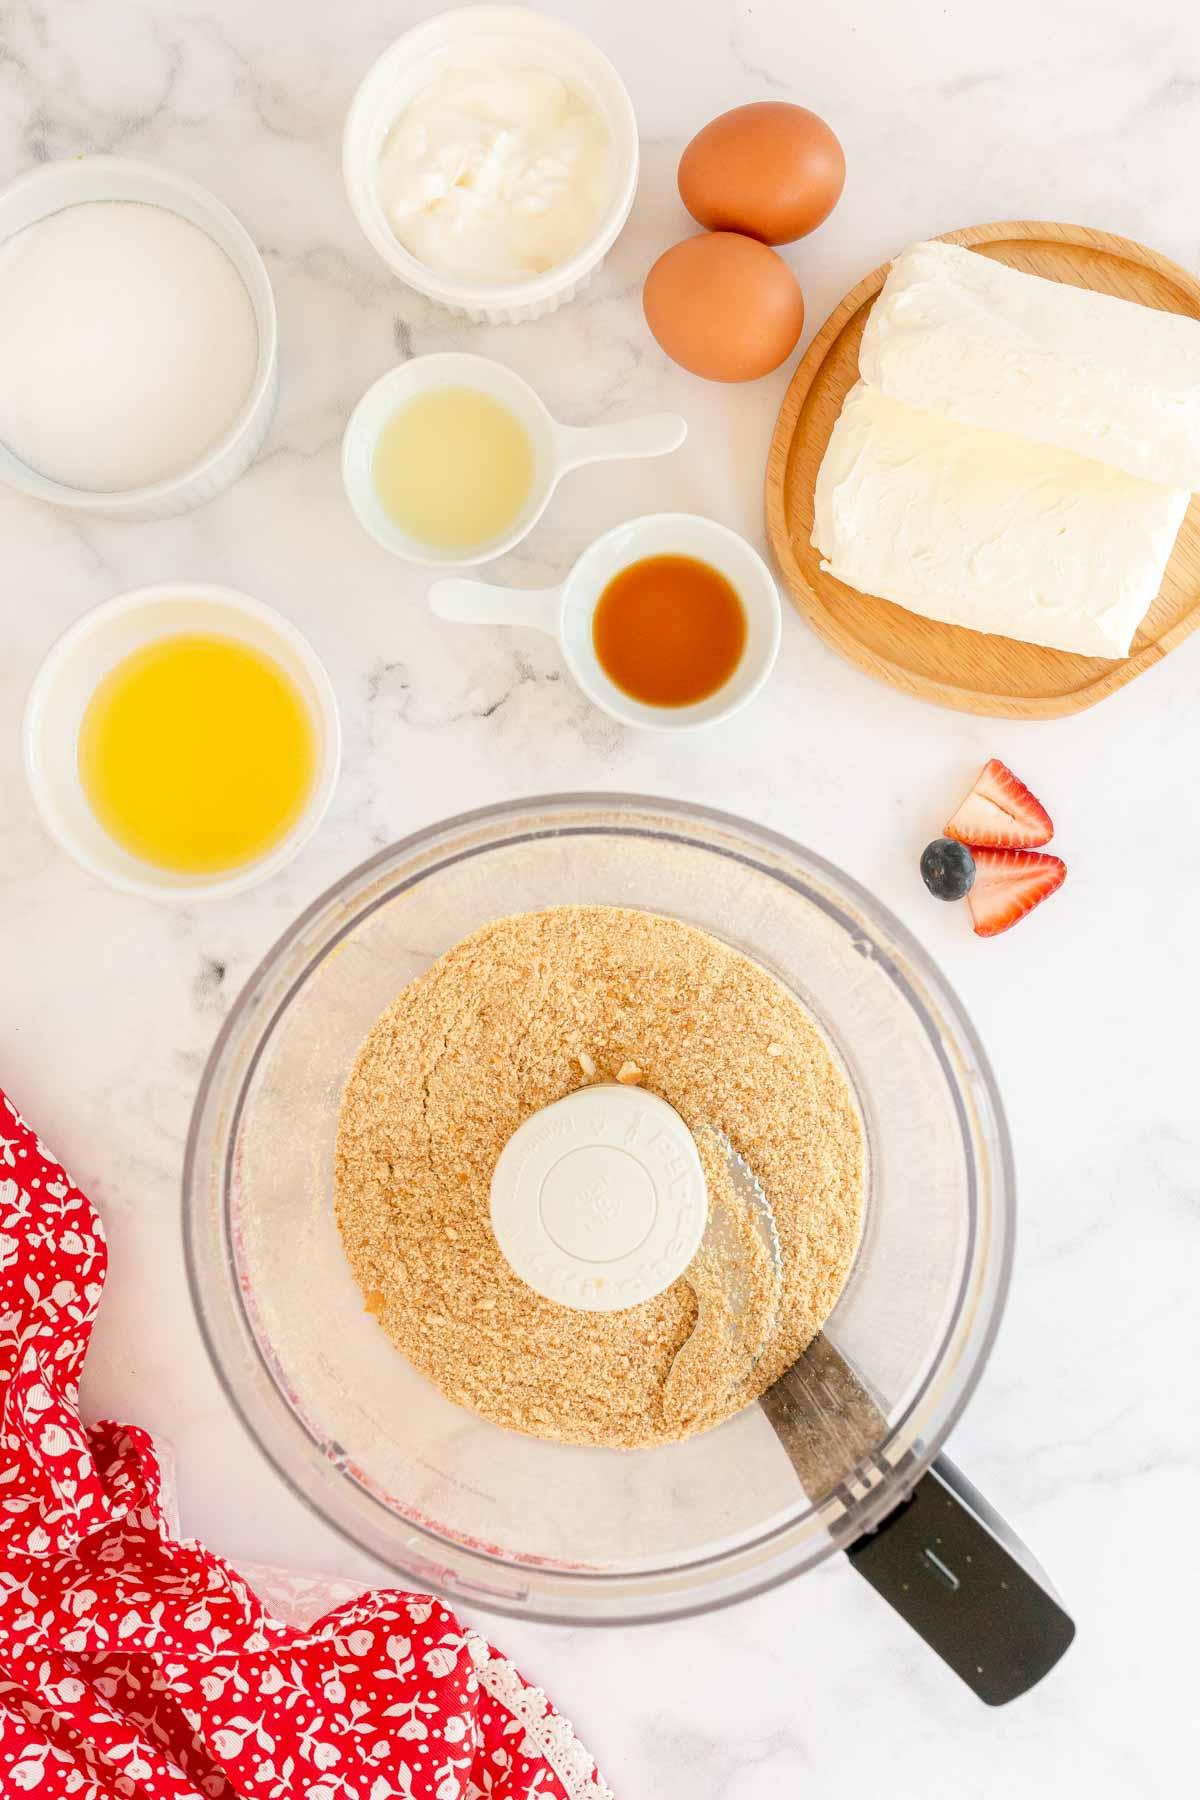 Vanilla Wafer crumbs in a food processor